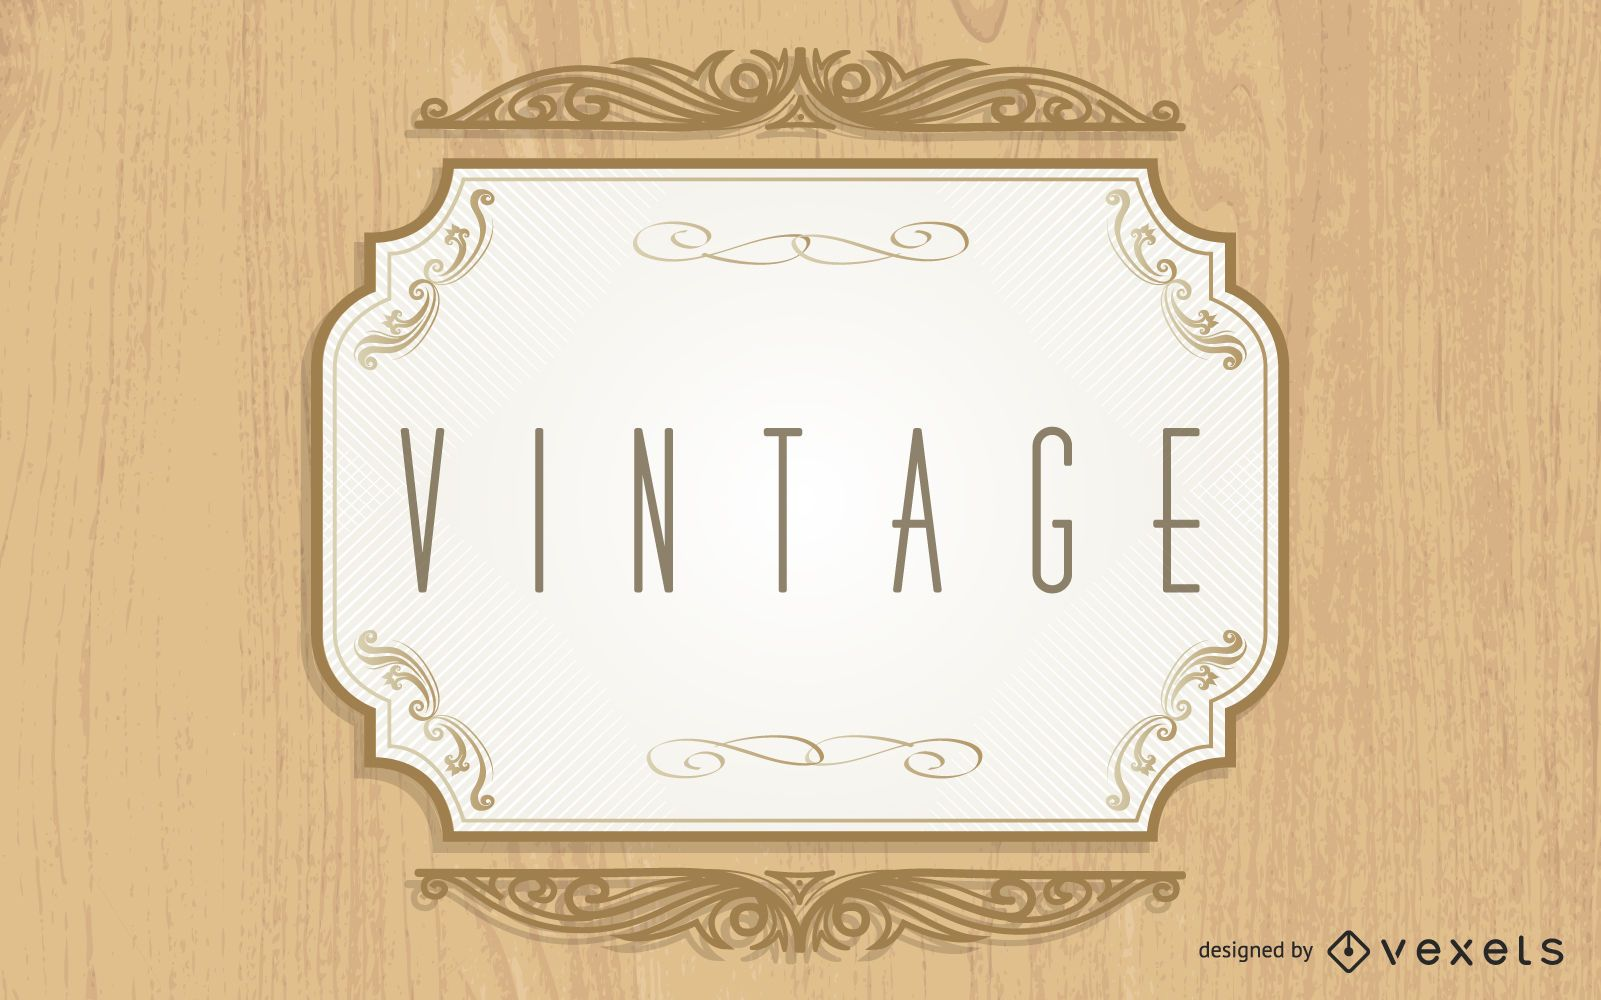 Creative Vintage Label Wooden Background